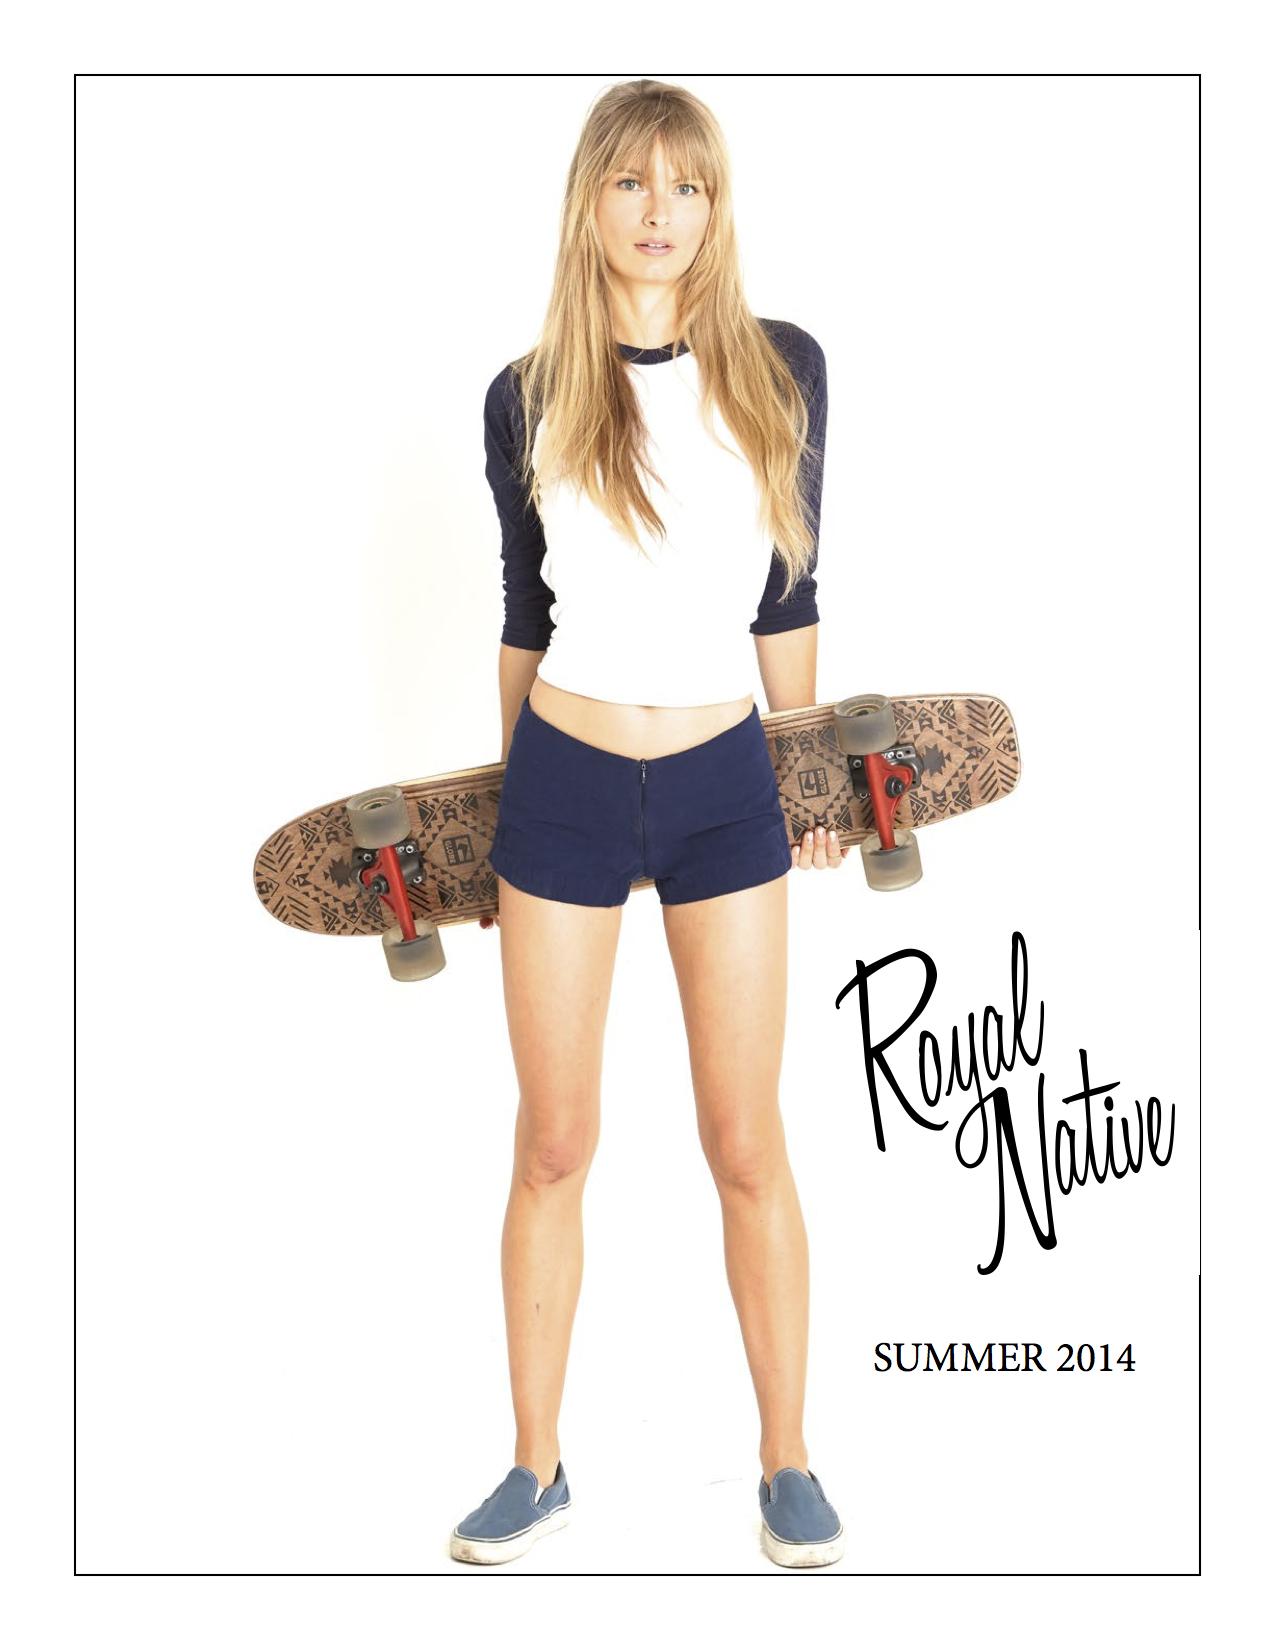 Royal-Native-Summer-14-LB-copy.jpg